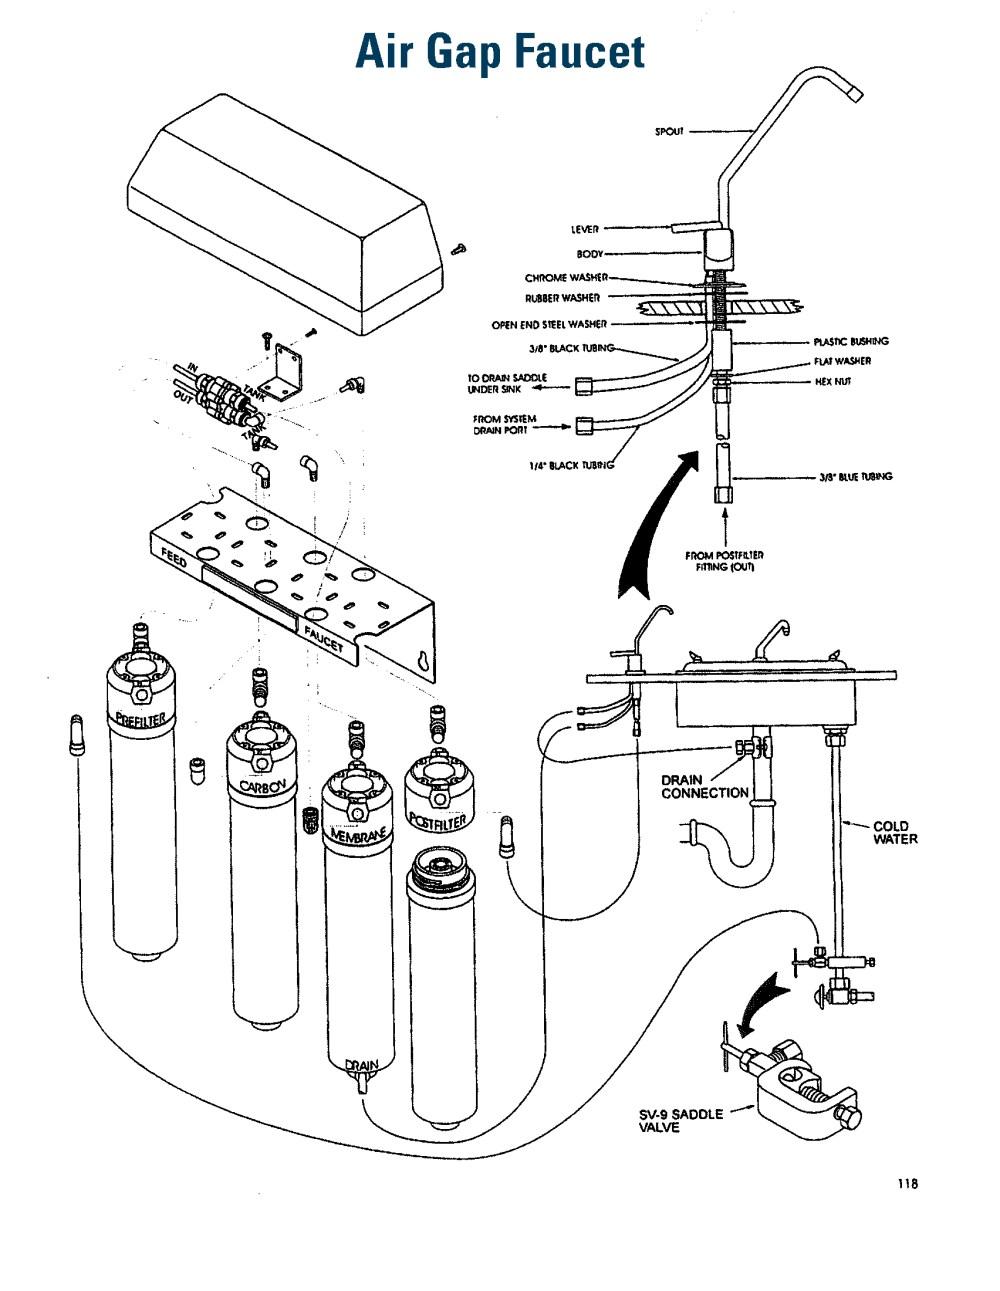 medium resolution of air gap faucet diagram